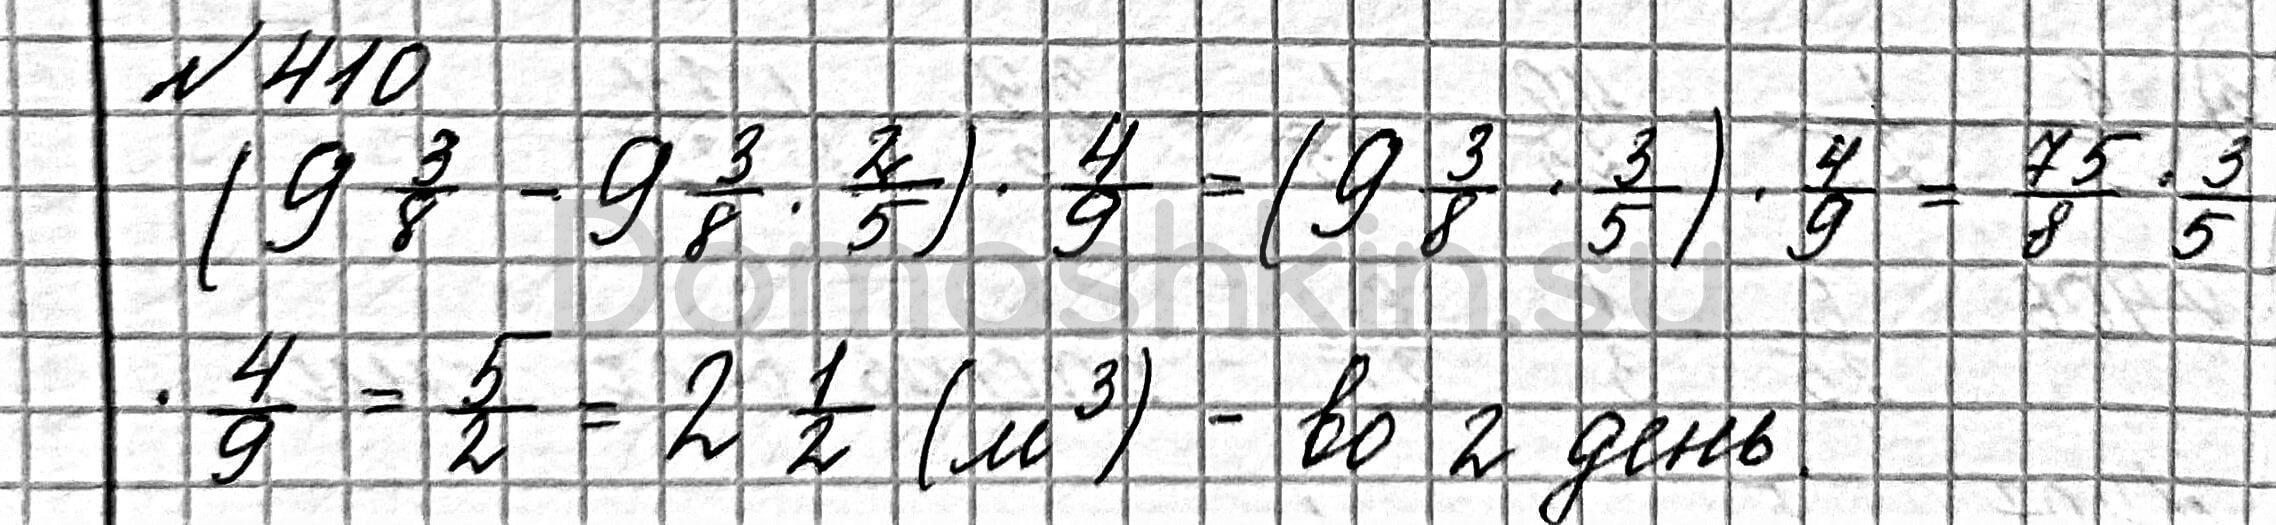 Математика 6 класс учебник Мерзляк номер 410 решение